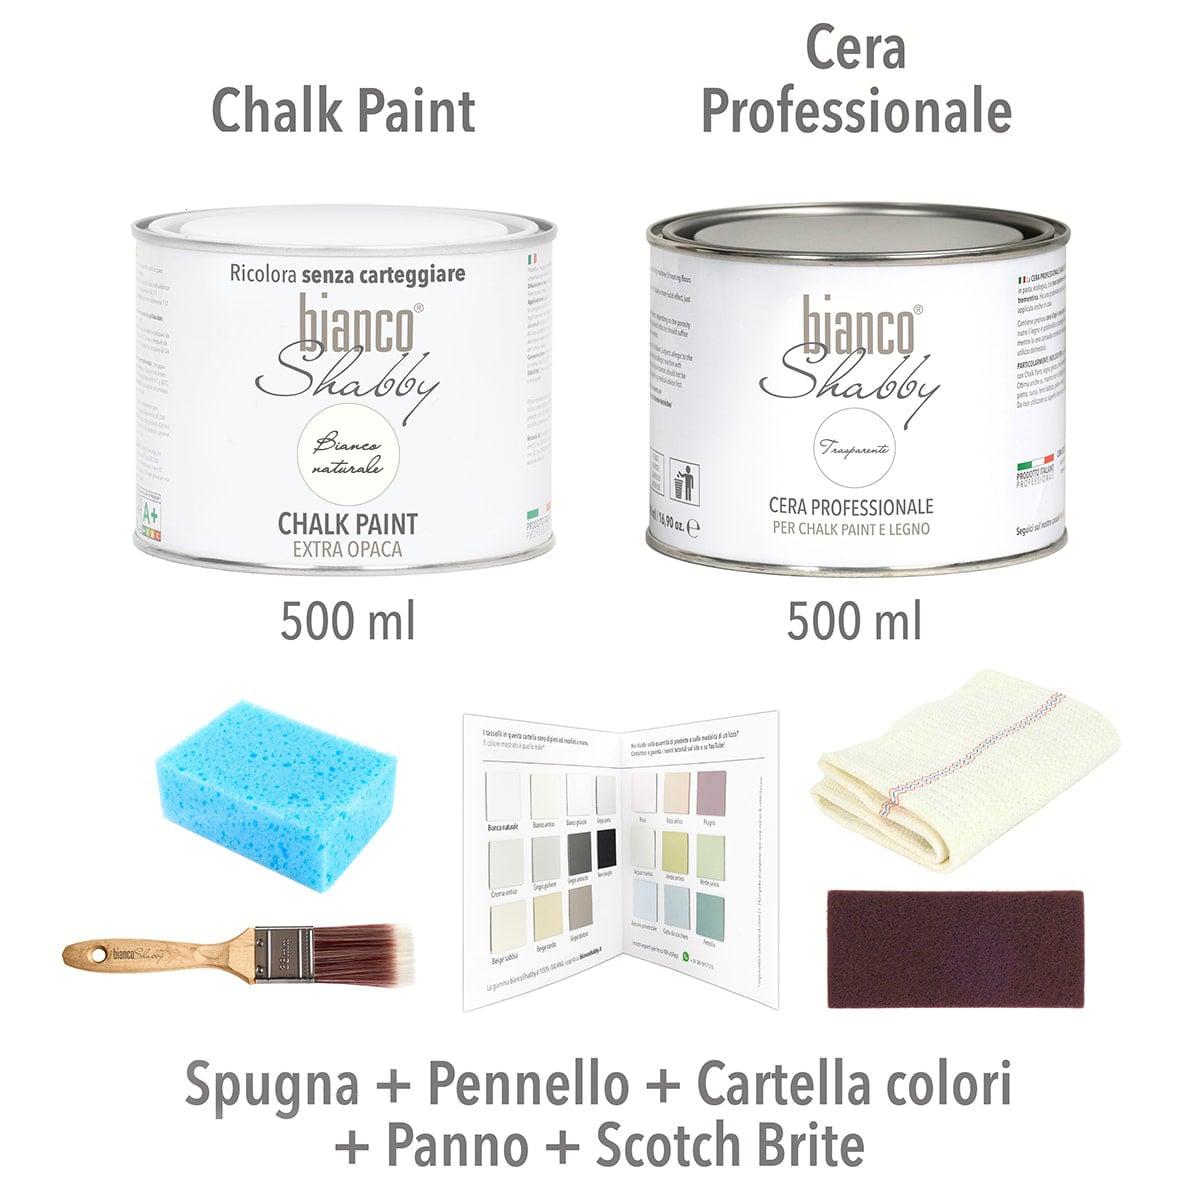 Chalk Paint Italiana Starter Kit In Offerta Prova La Qualita Biancoshabby